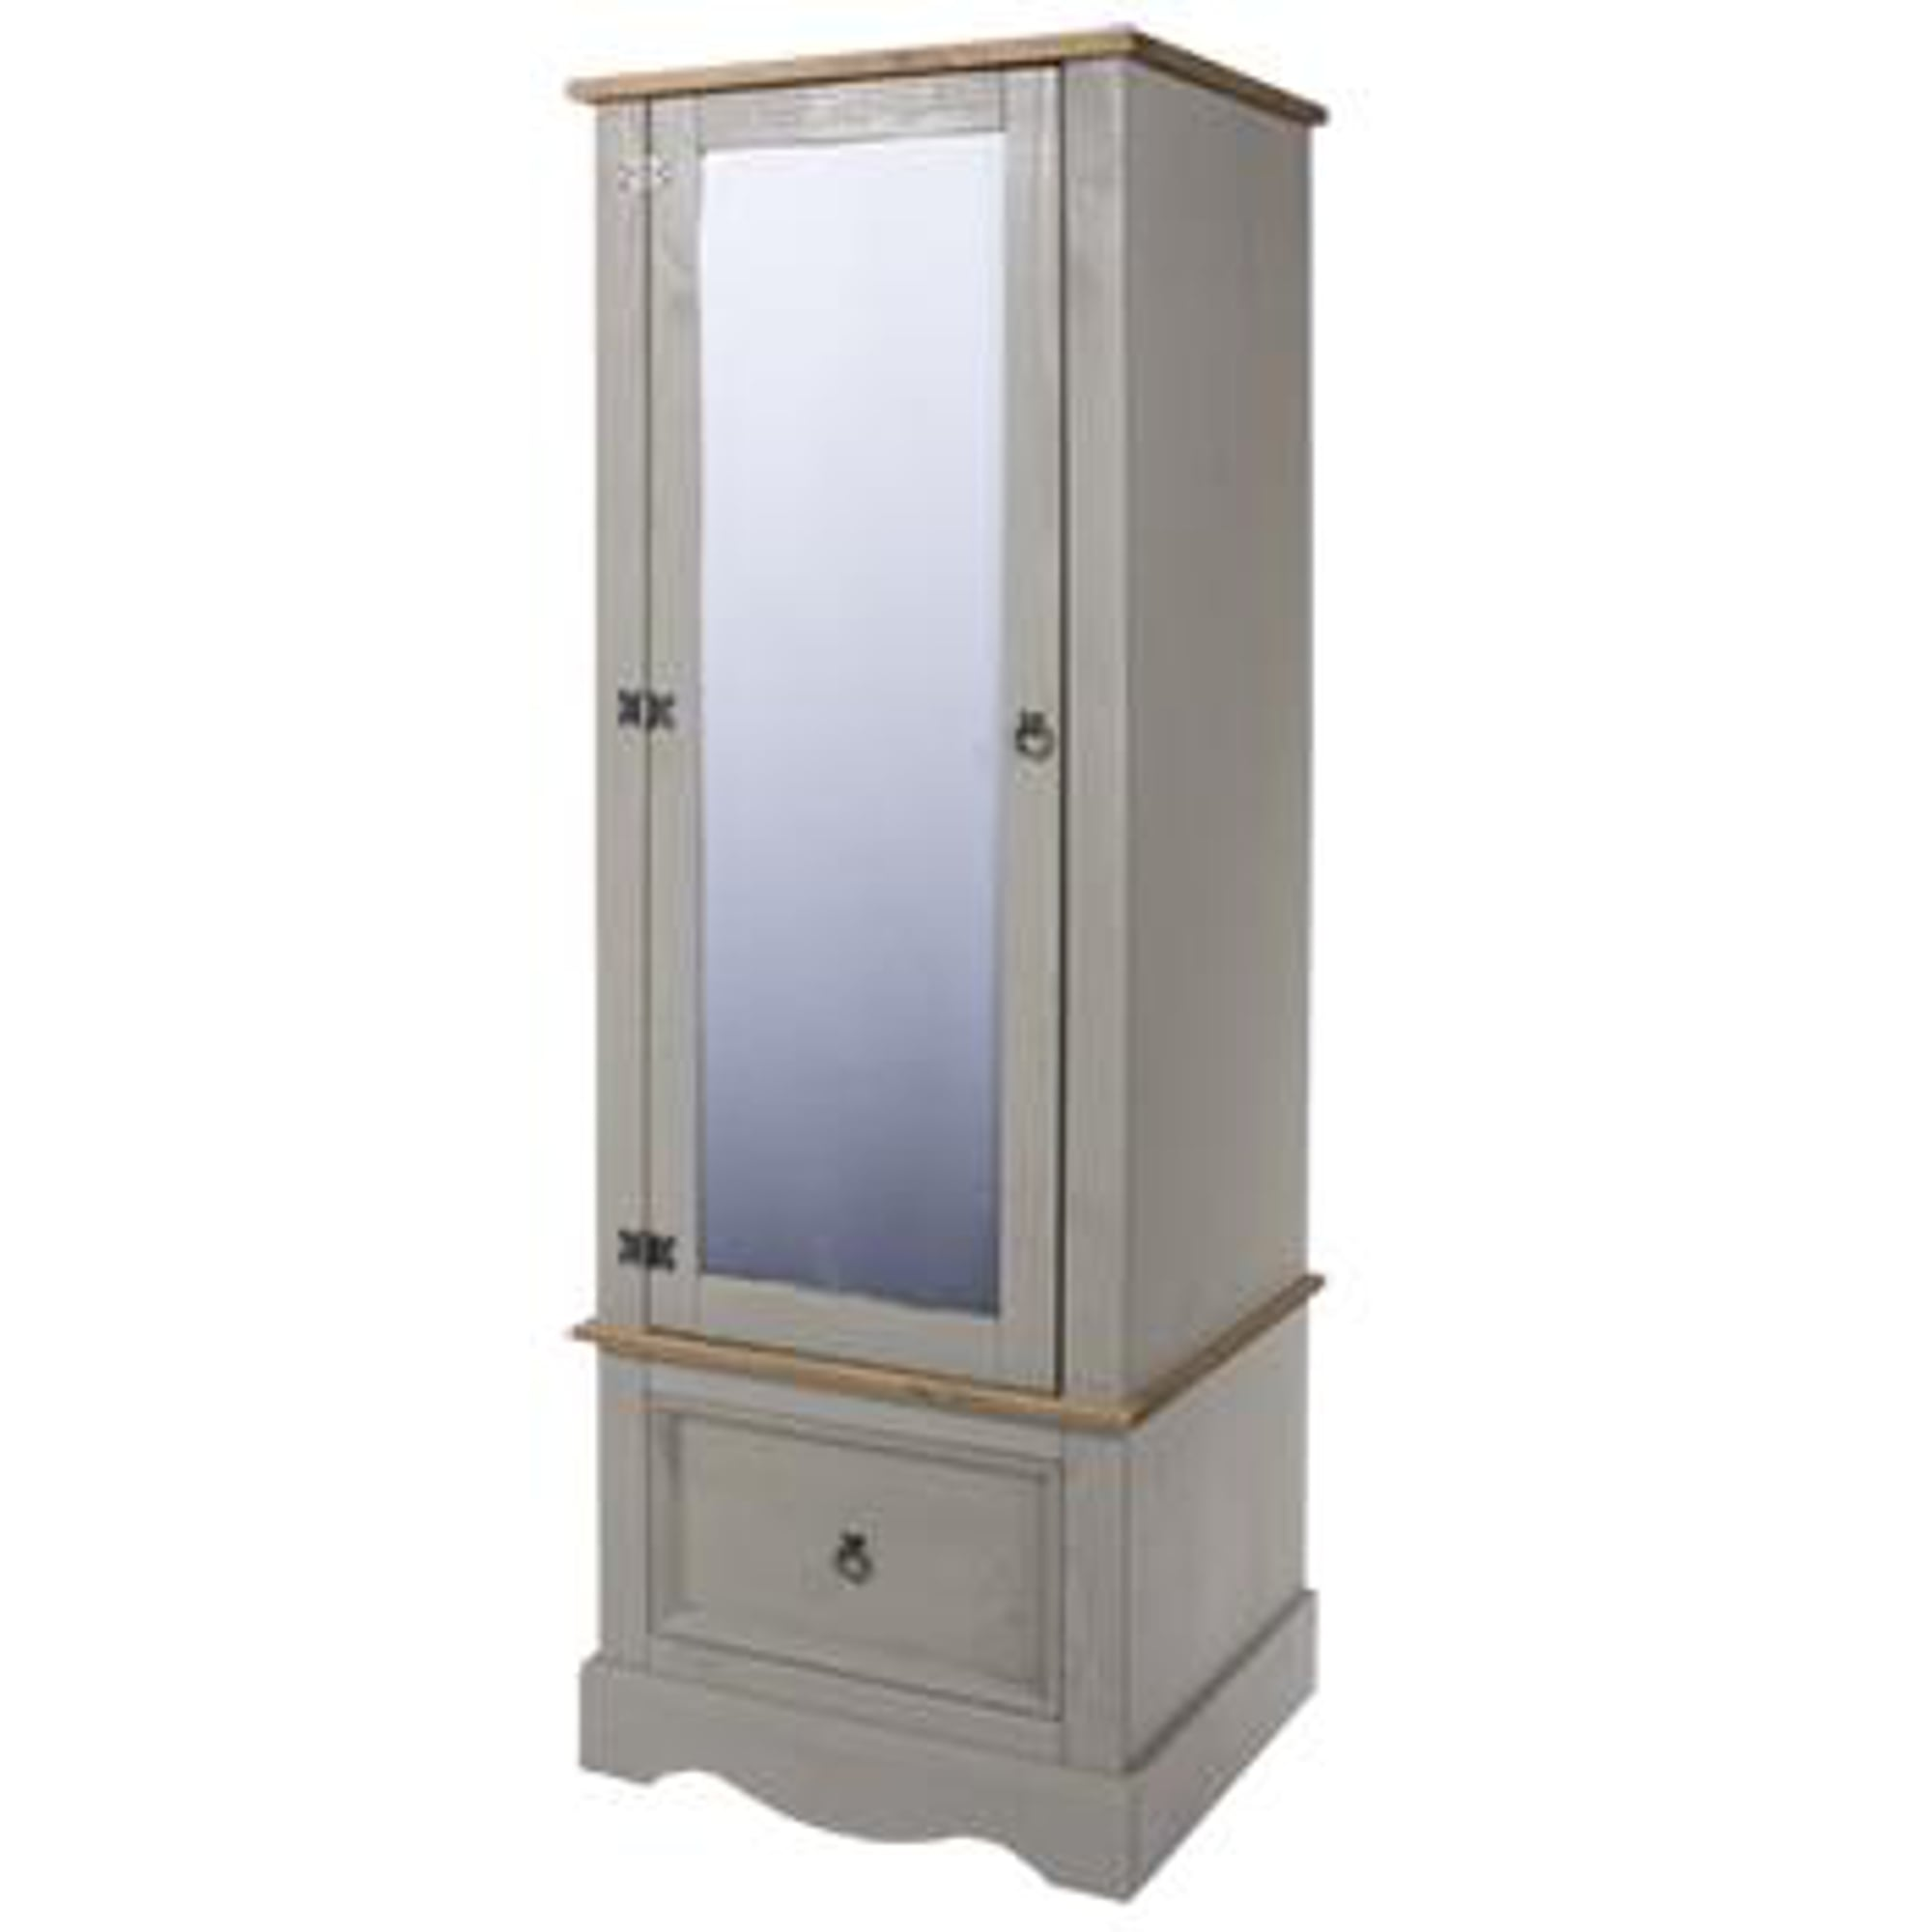 wh baby furniture ideas ashley wardrobe stunning corner mirrored narrow for jewelry ikea closet armoire home storage